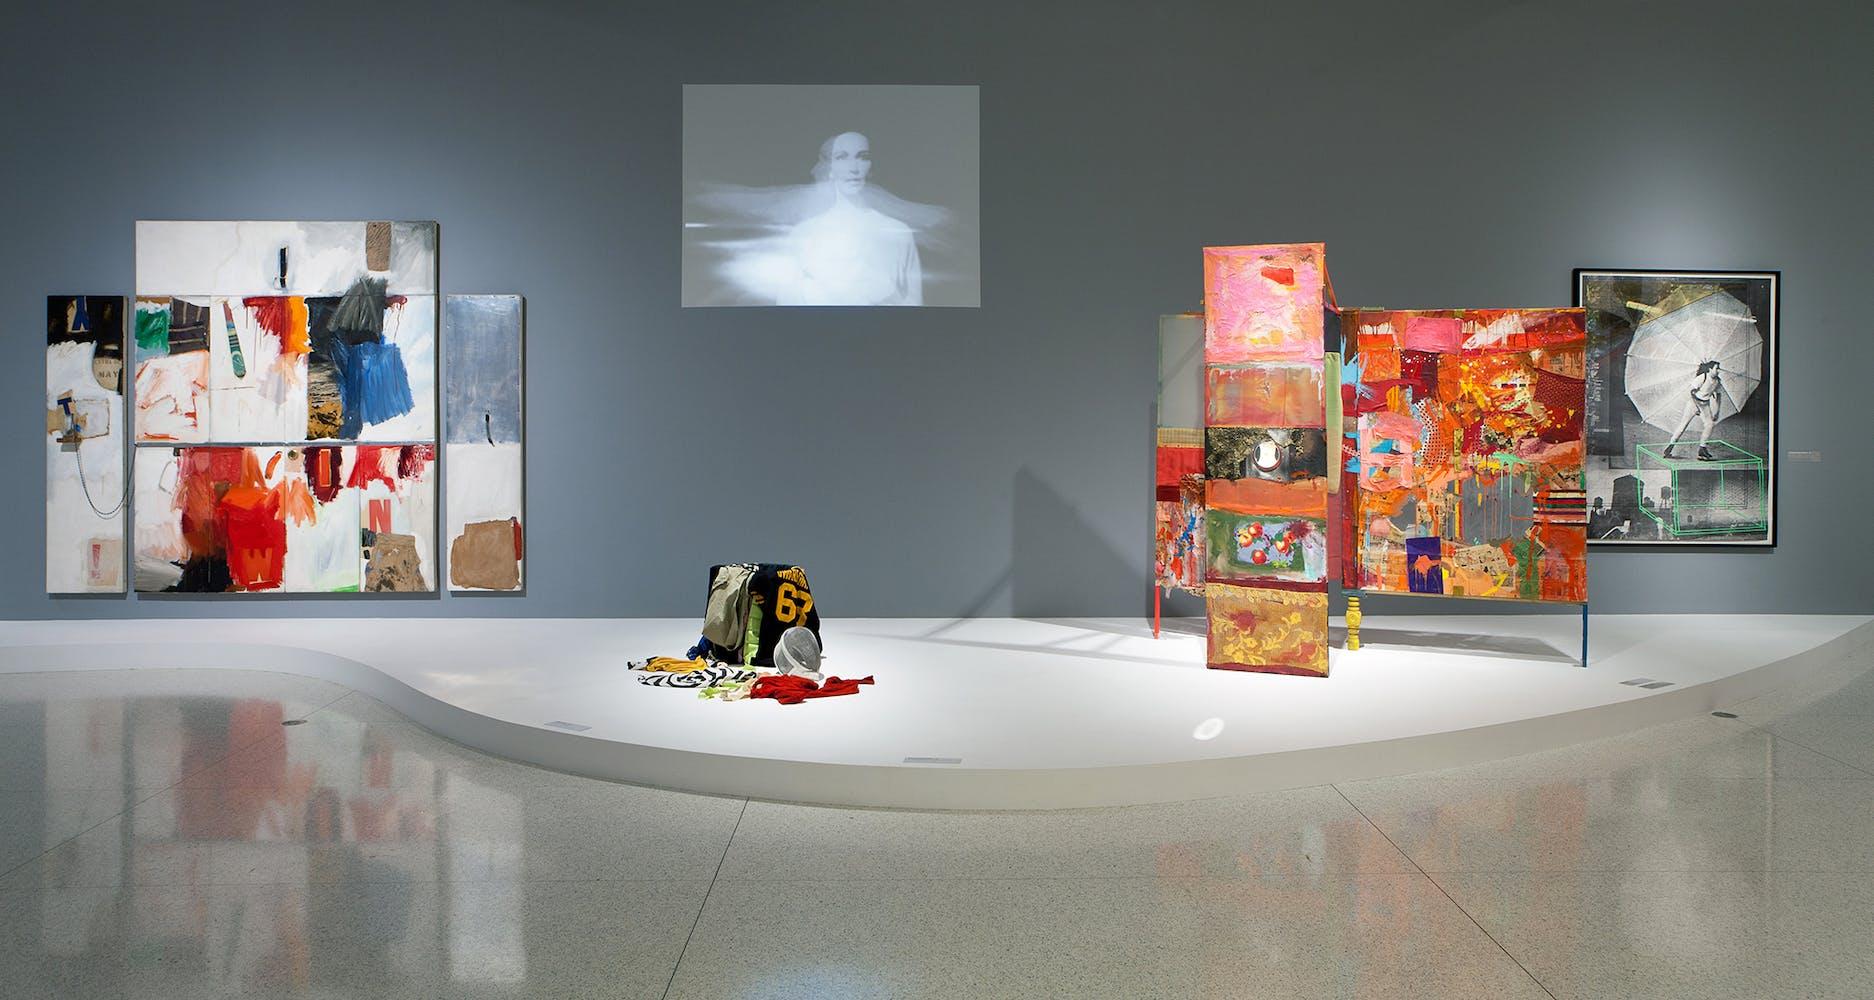 Installation view of the exhibition Dance Works I: Merce Cunningham/Robert Rauschenberg, 2011